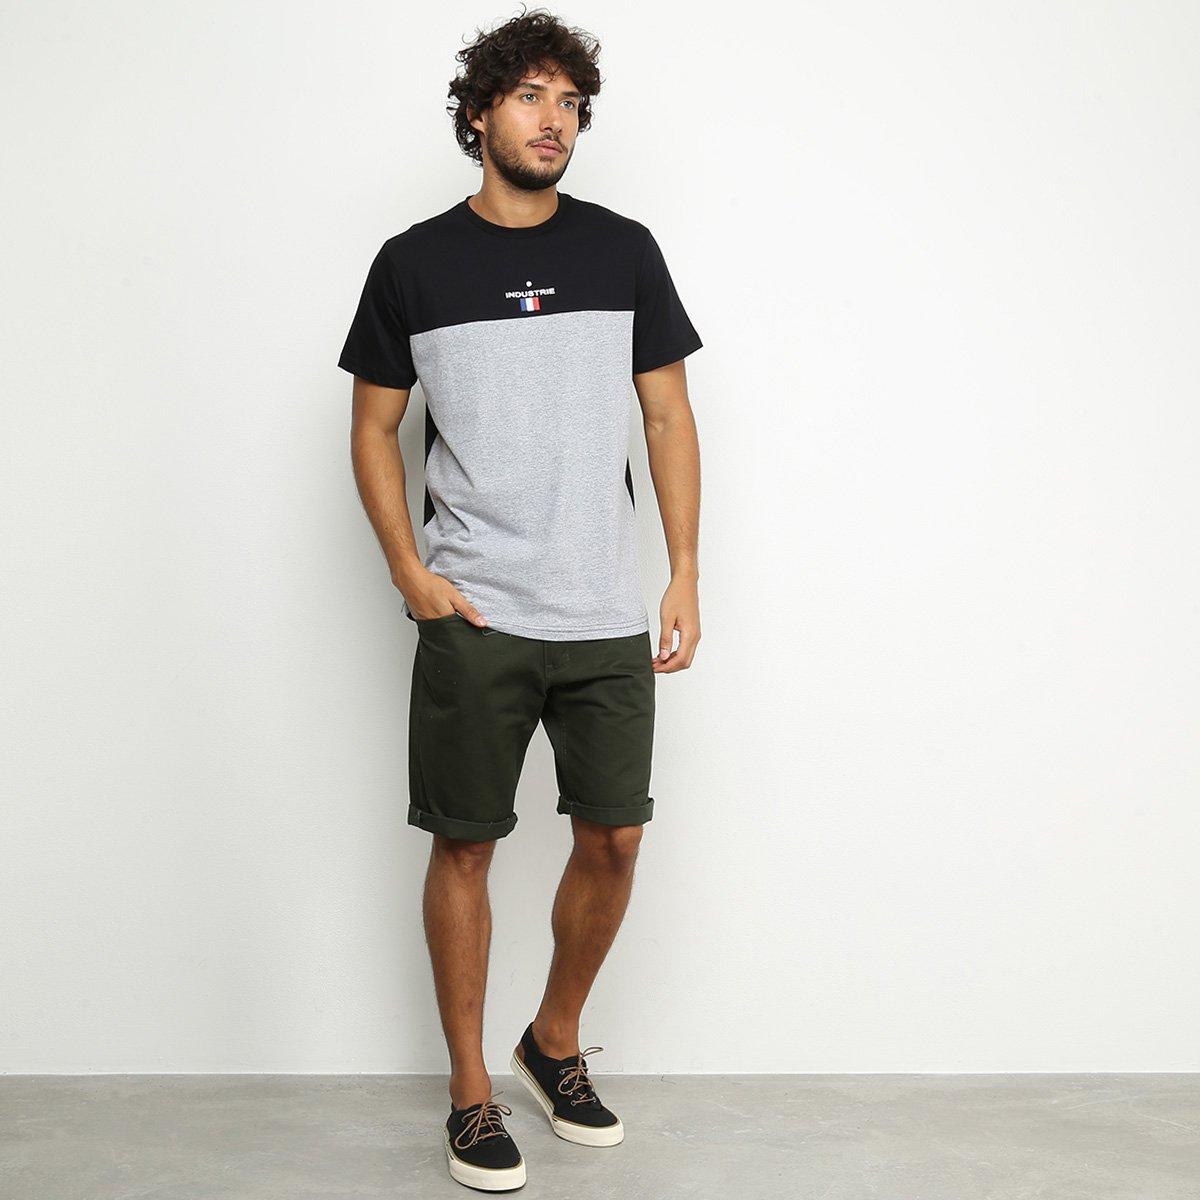 Camiseta Industrie Paris Masculina - Preto e Cinza